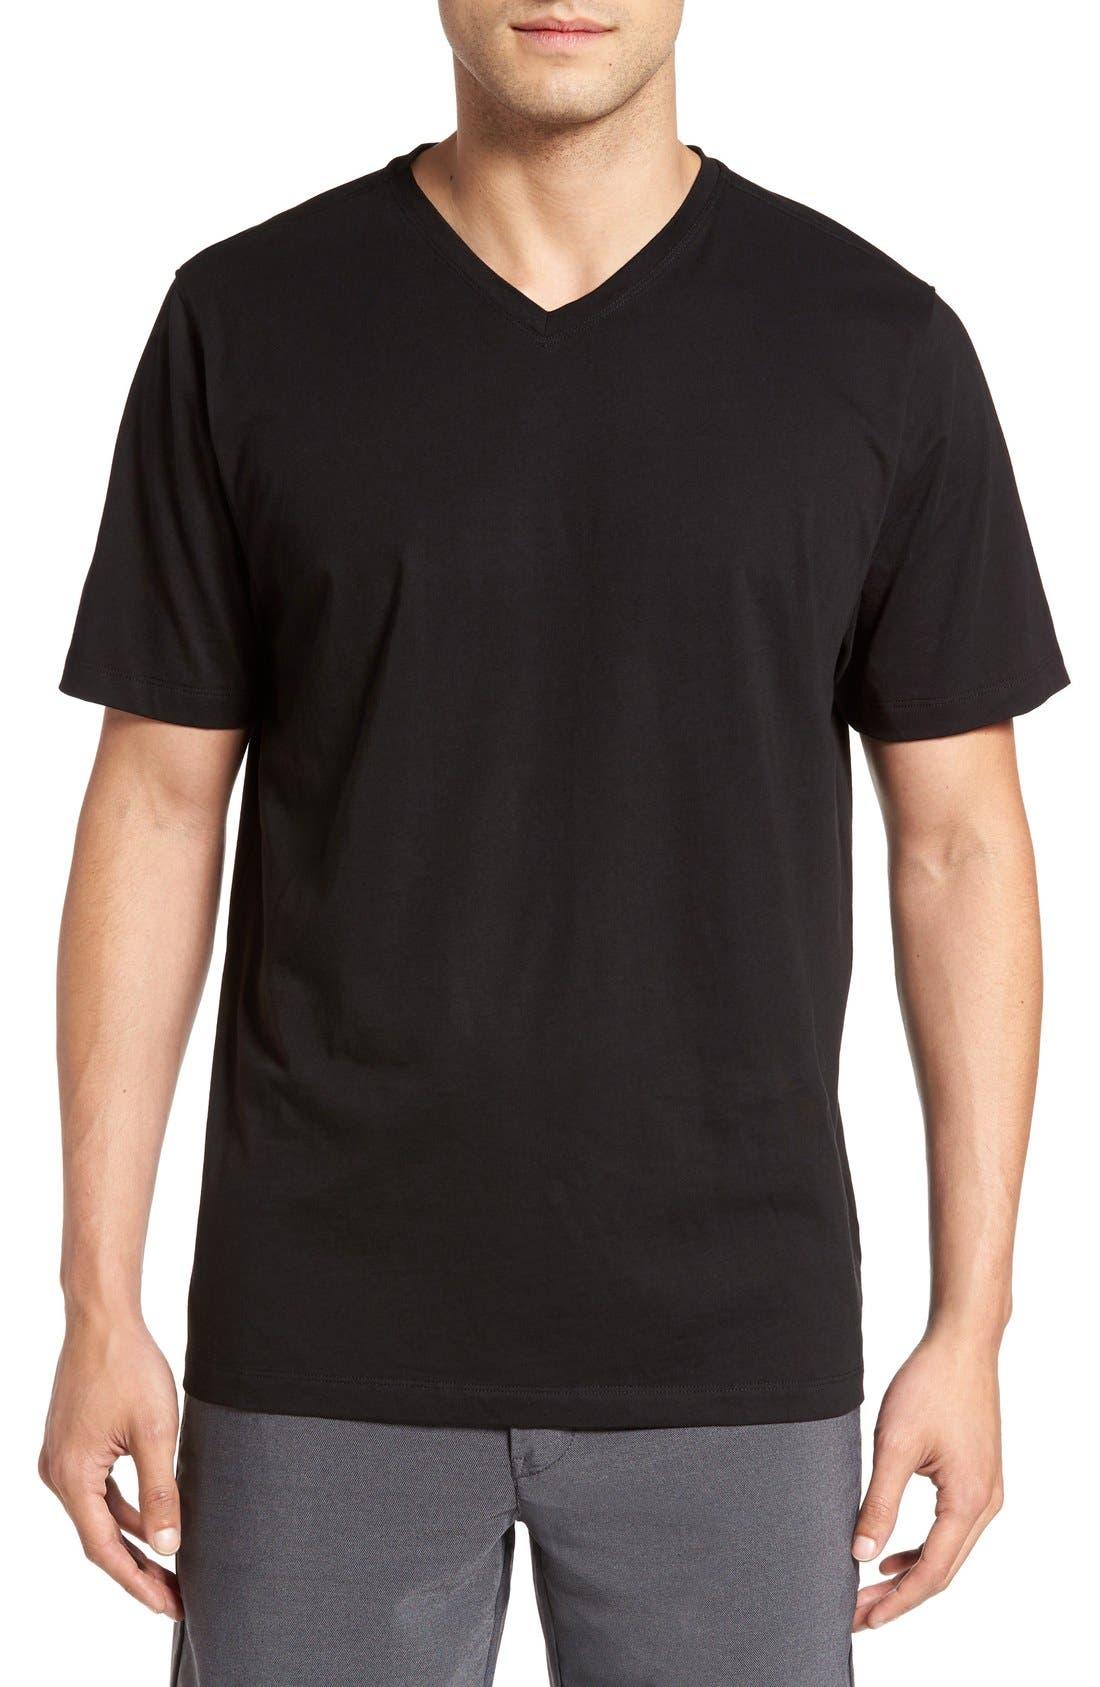 Main Image - Cutter & Buck 'Sida' V-Neck T-Shirt (Big & Tall)